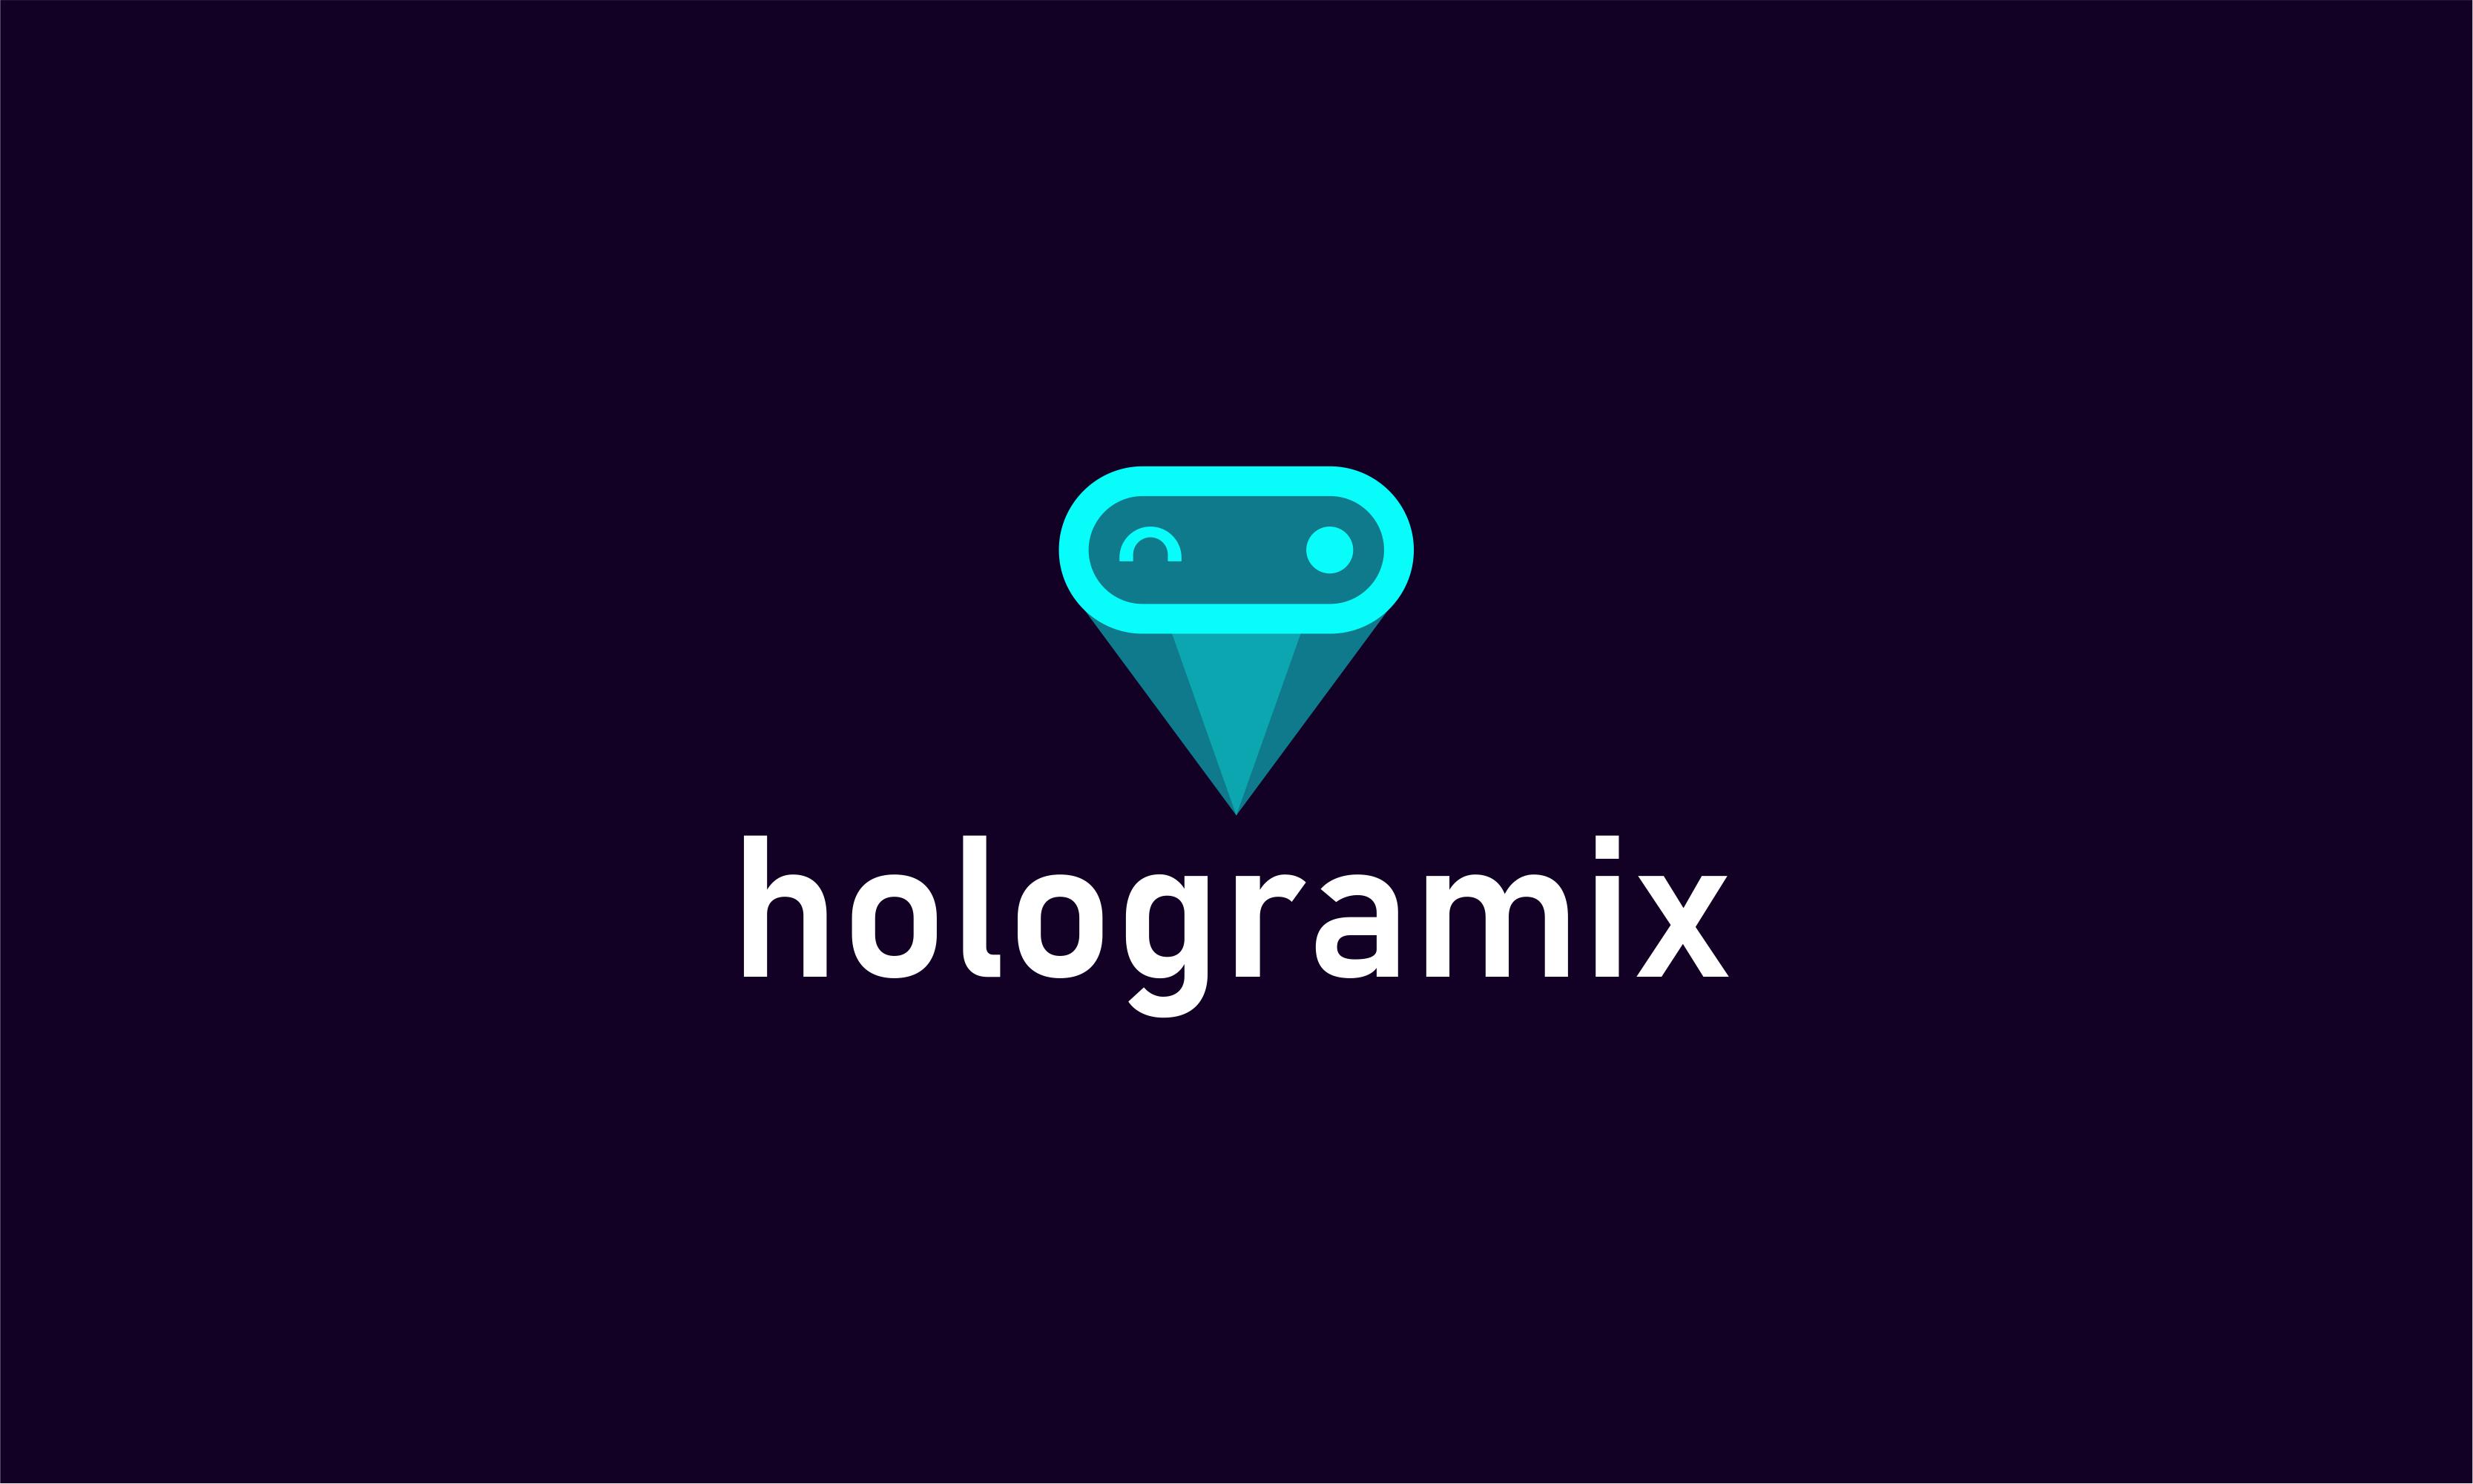 Hologramix